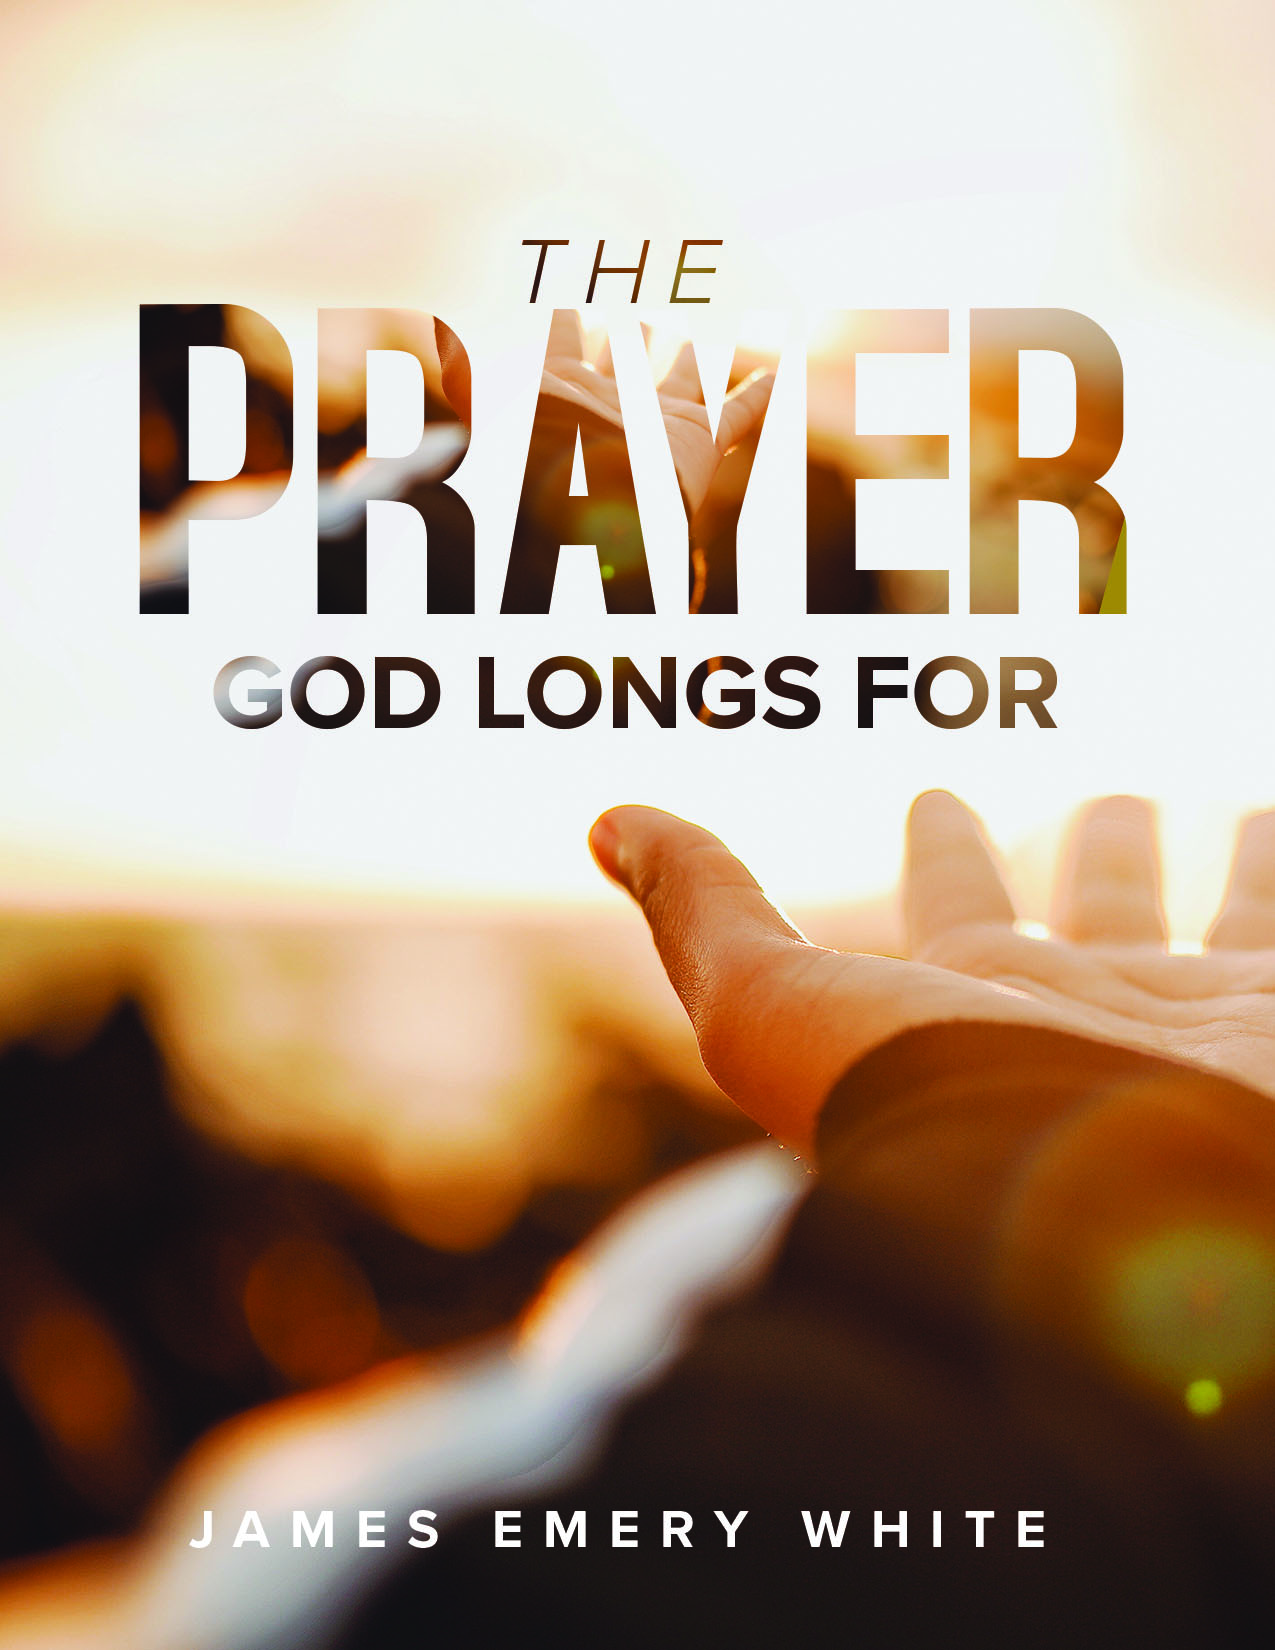 The Prayer God Longs For_Book Cover_March_2019.jpg